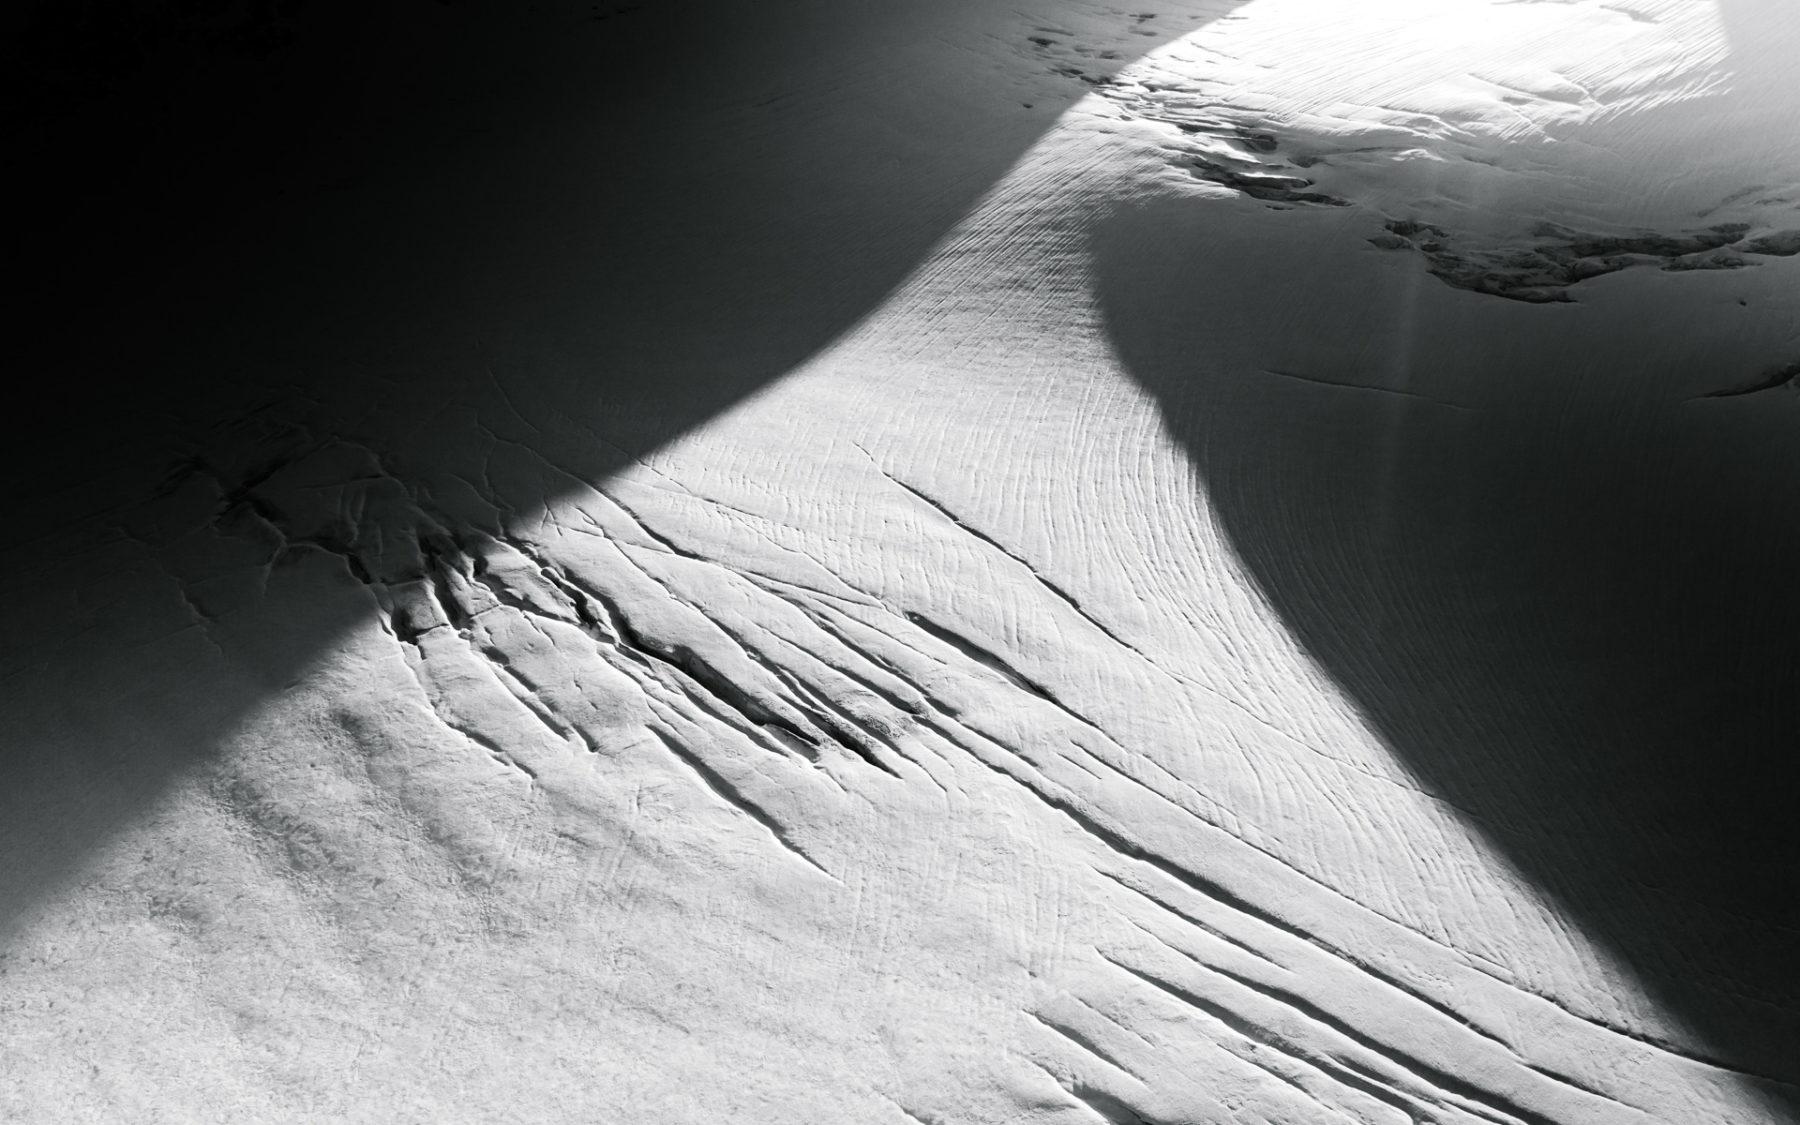 nls 2001 norway iceland portraits of glaciers 01